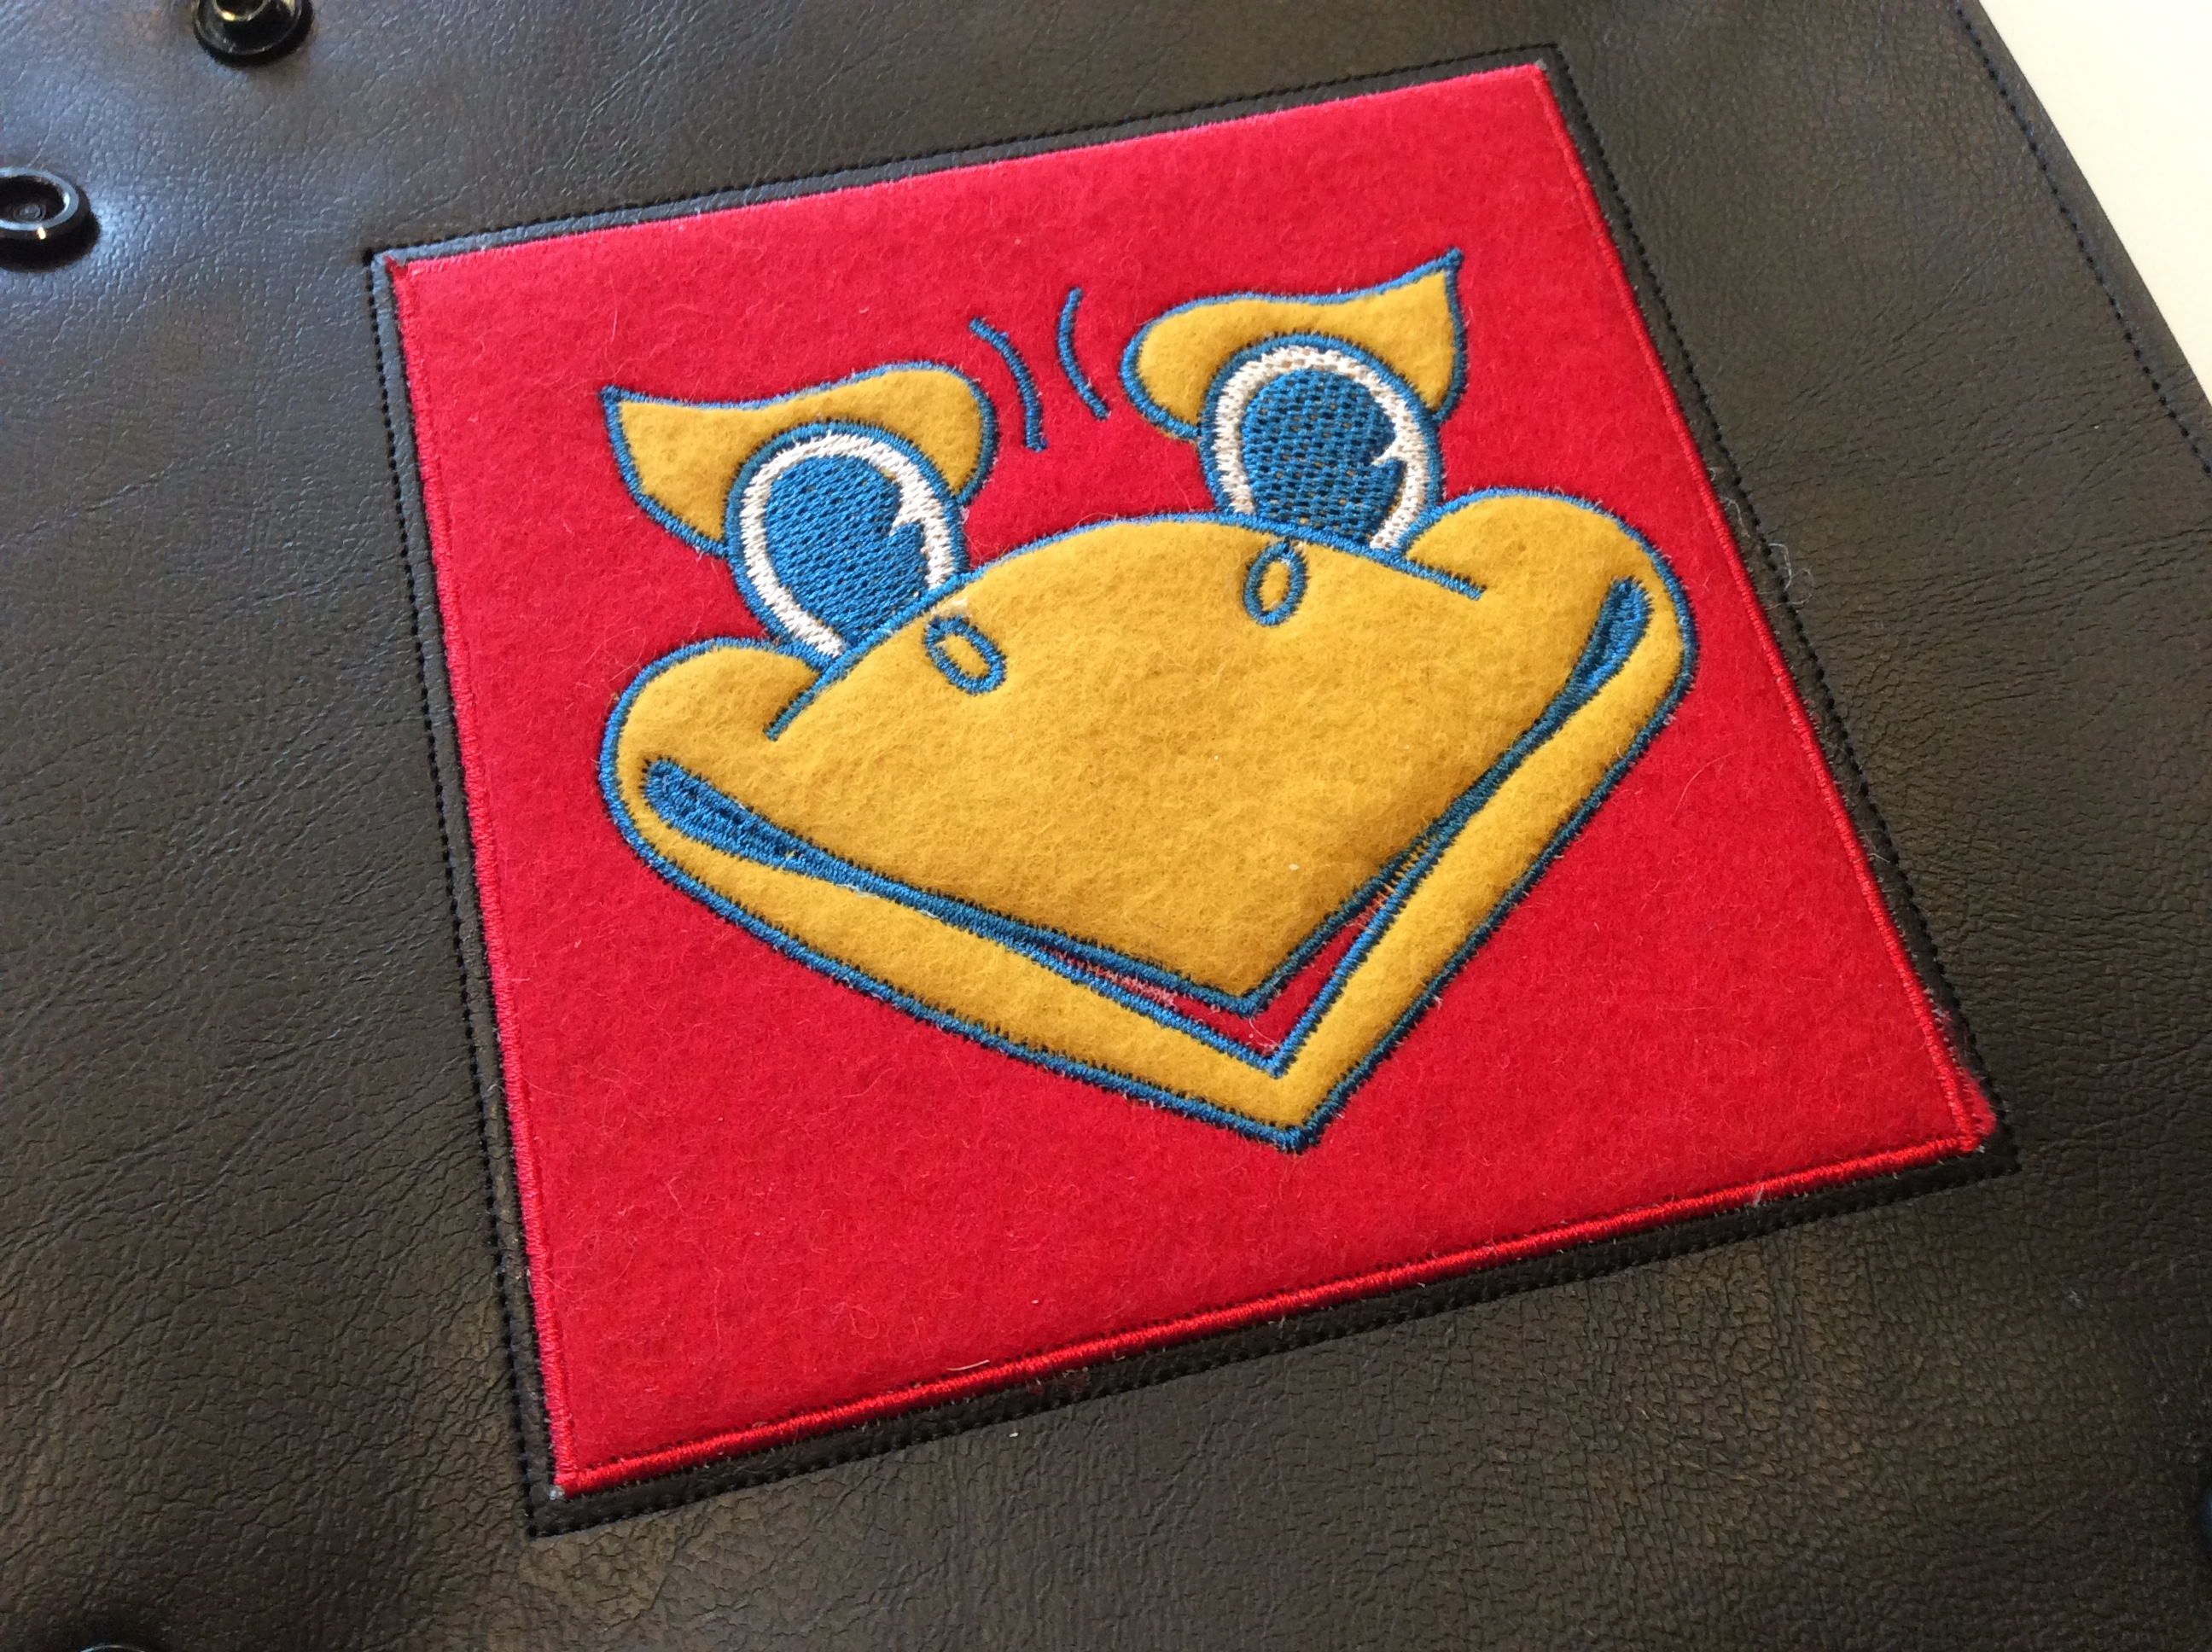 Embroidered Kansas Jayhawk mascot logo